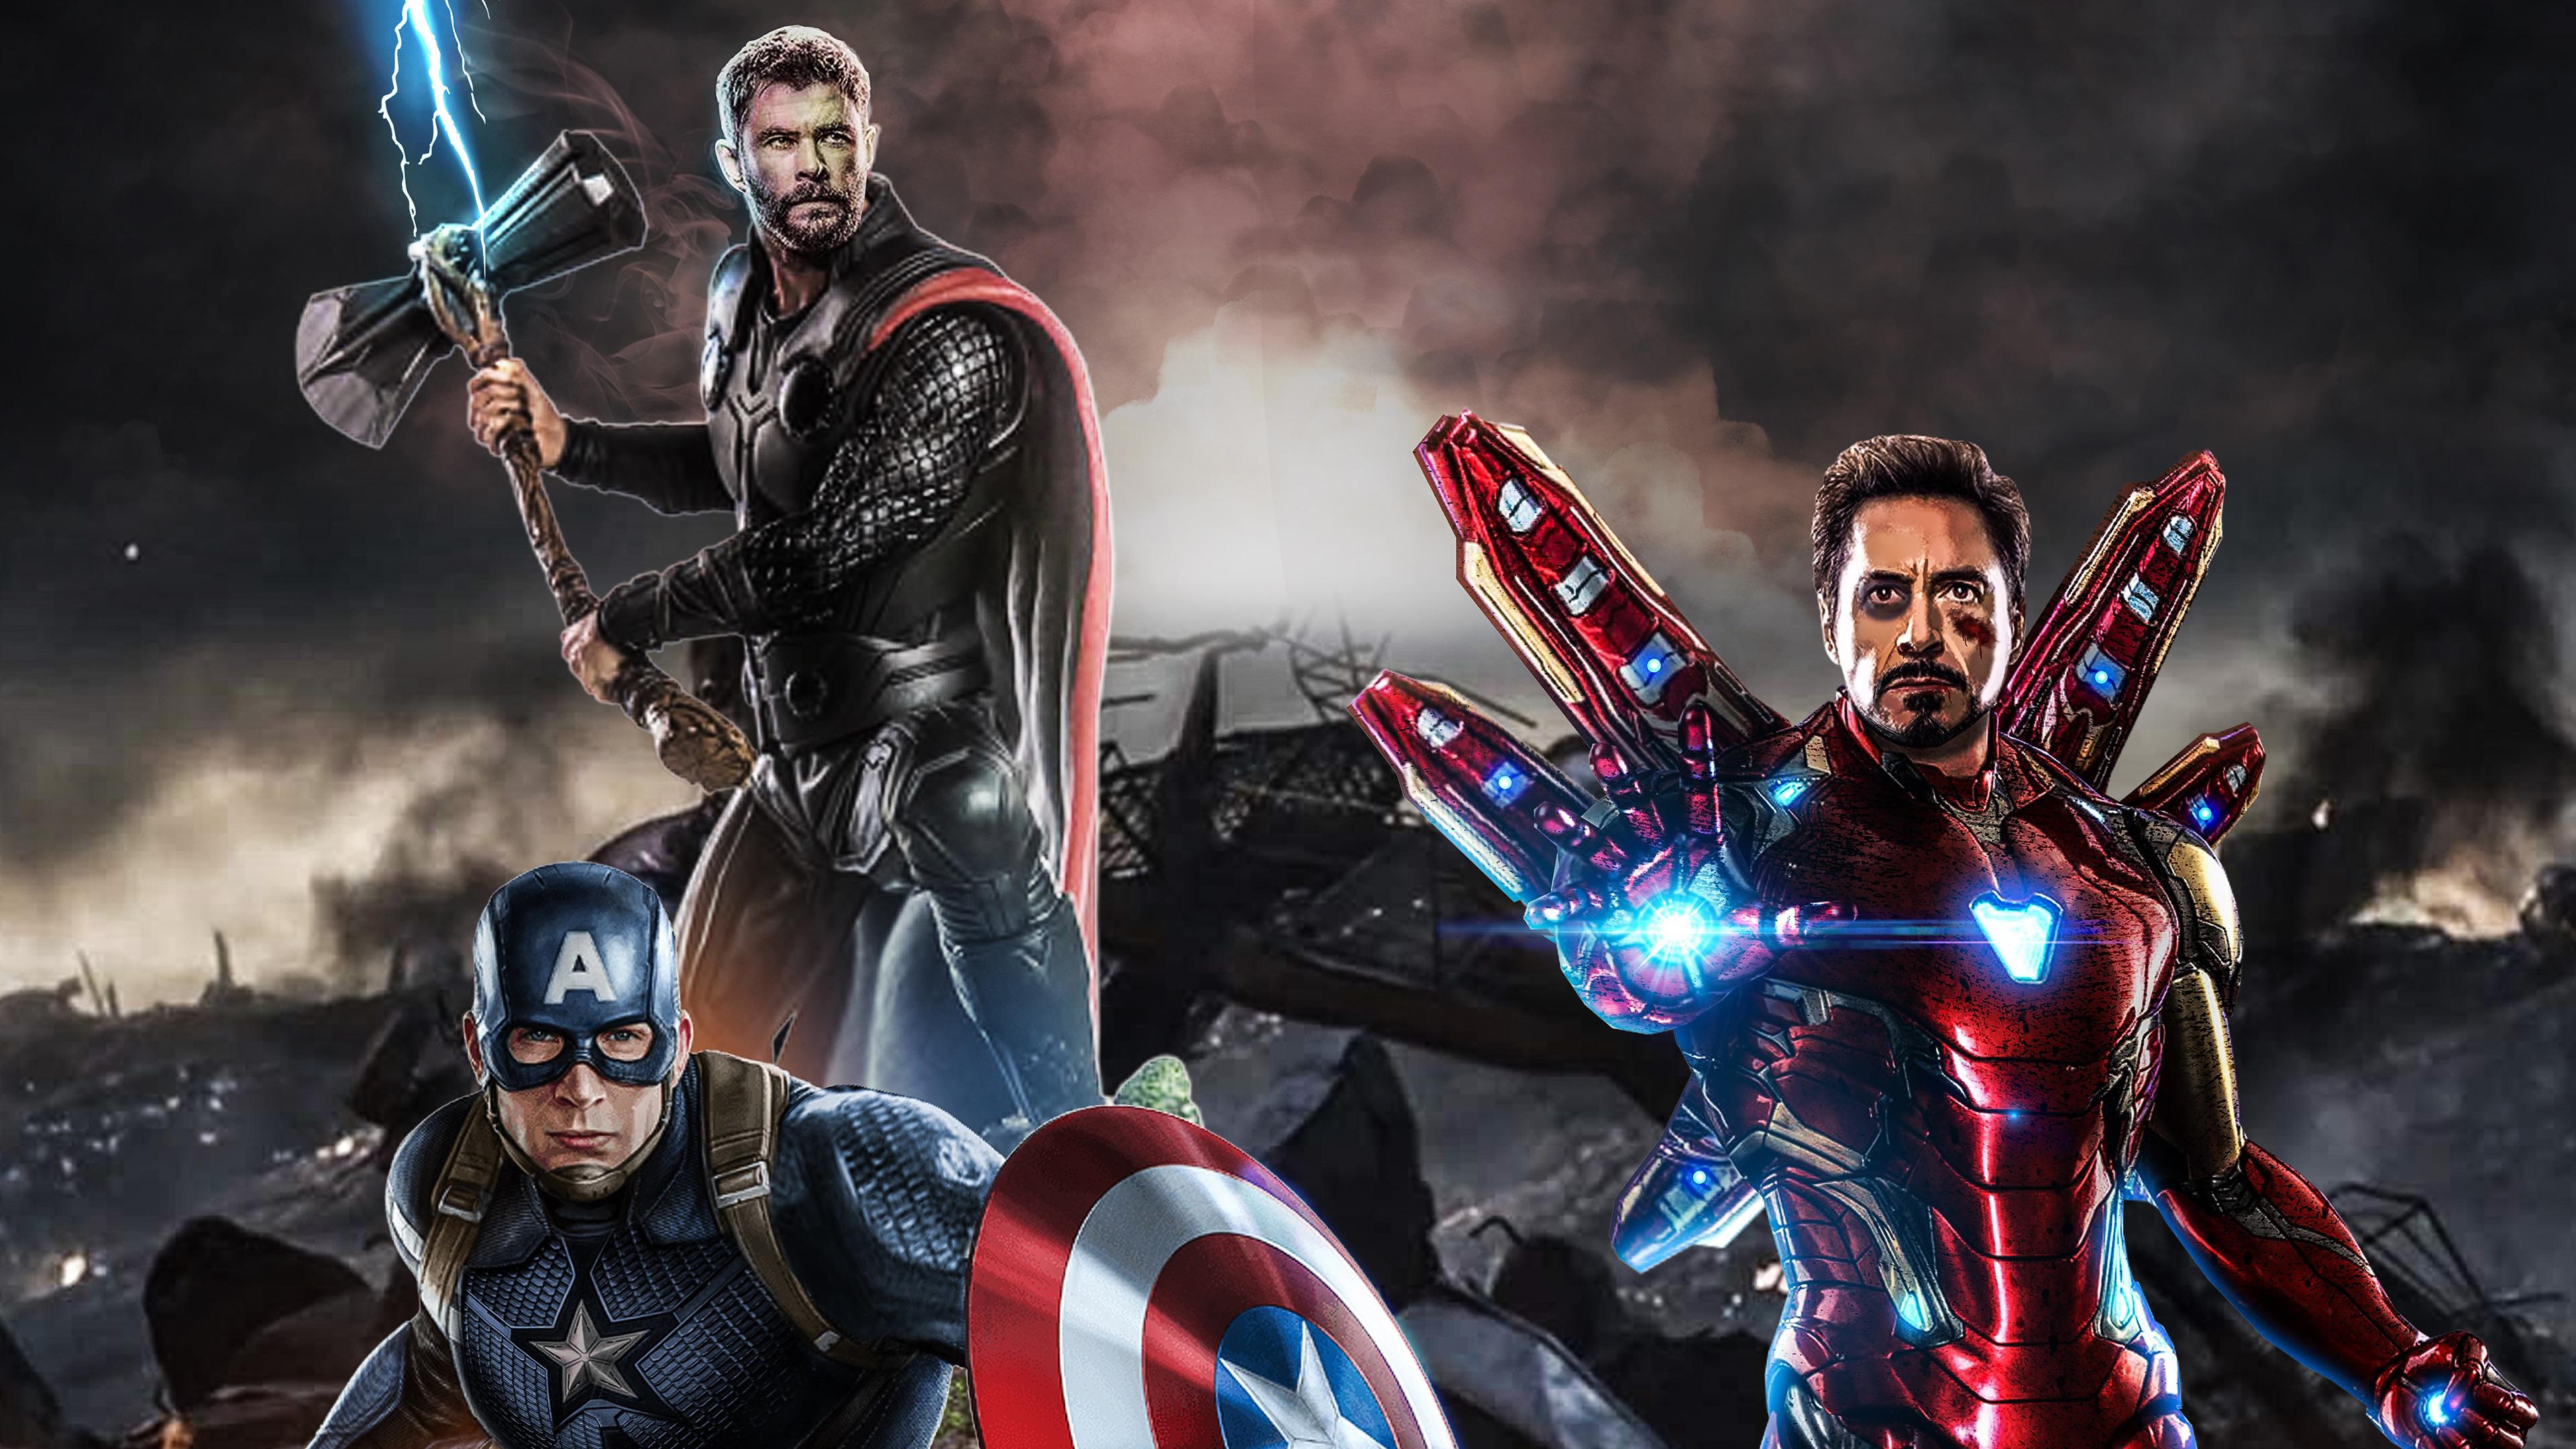 Avengers Endgame The Big Three Hd Superheroes 4k